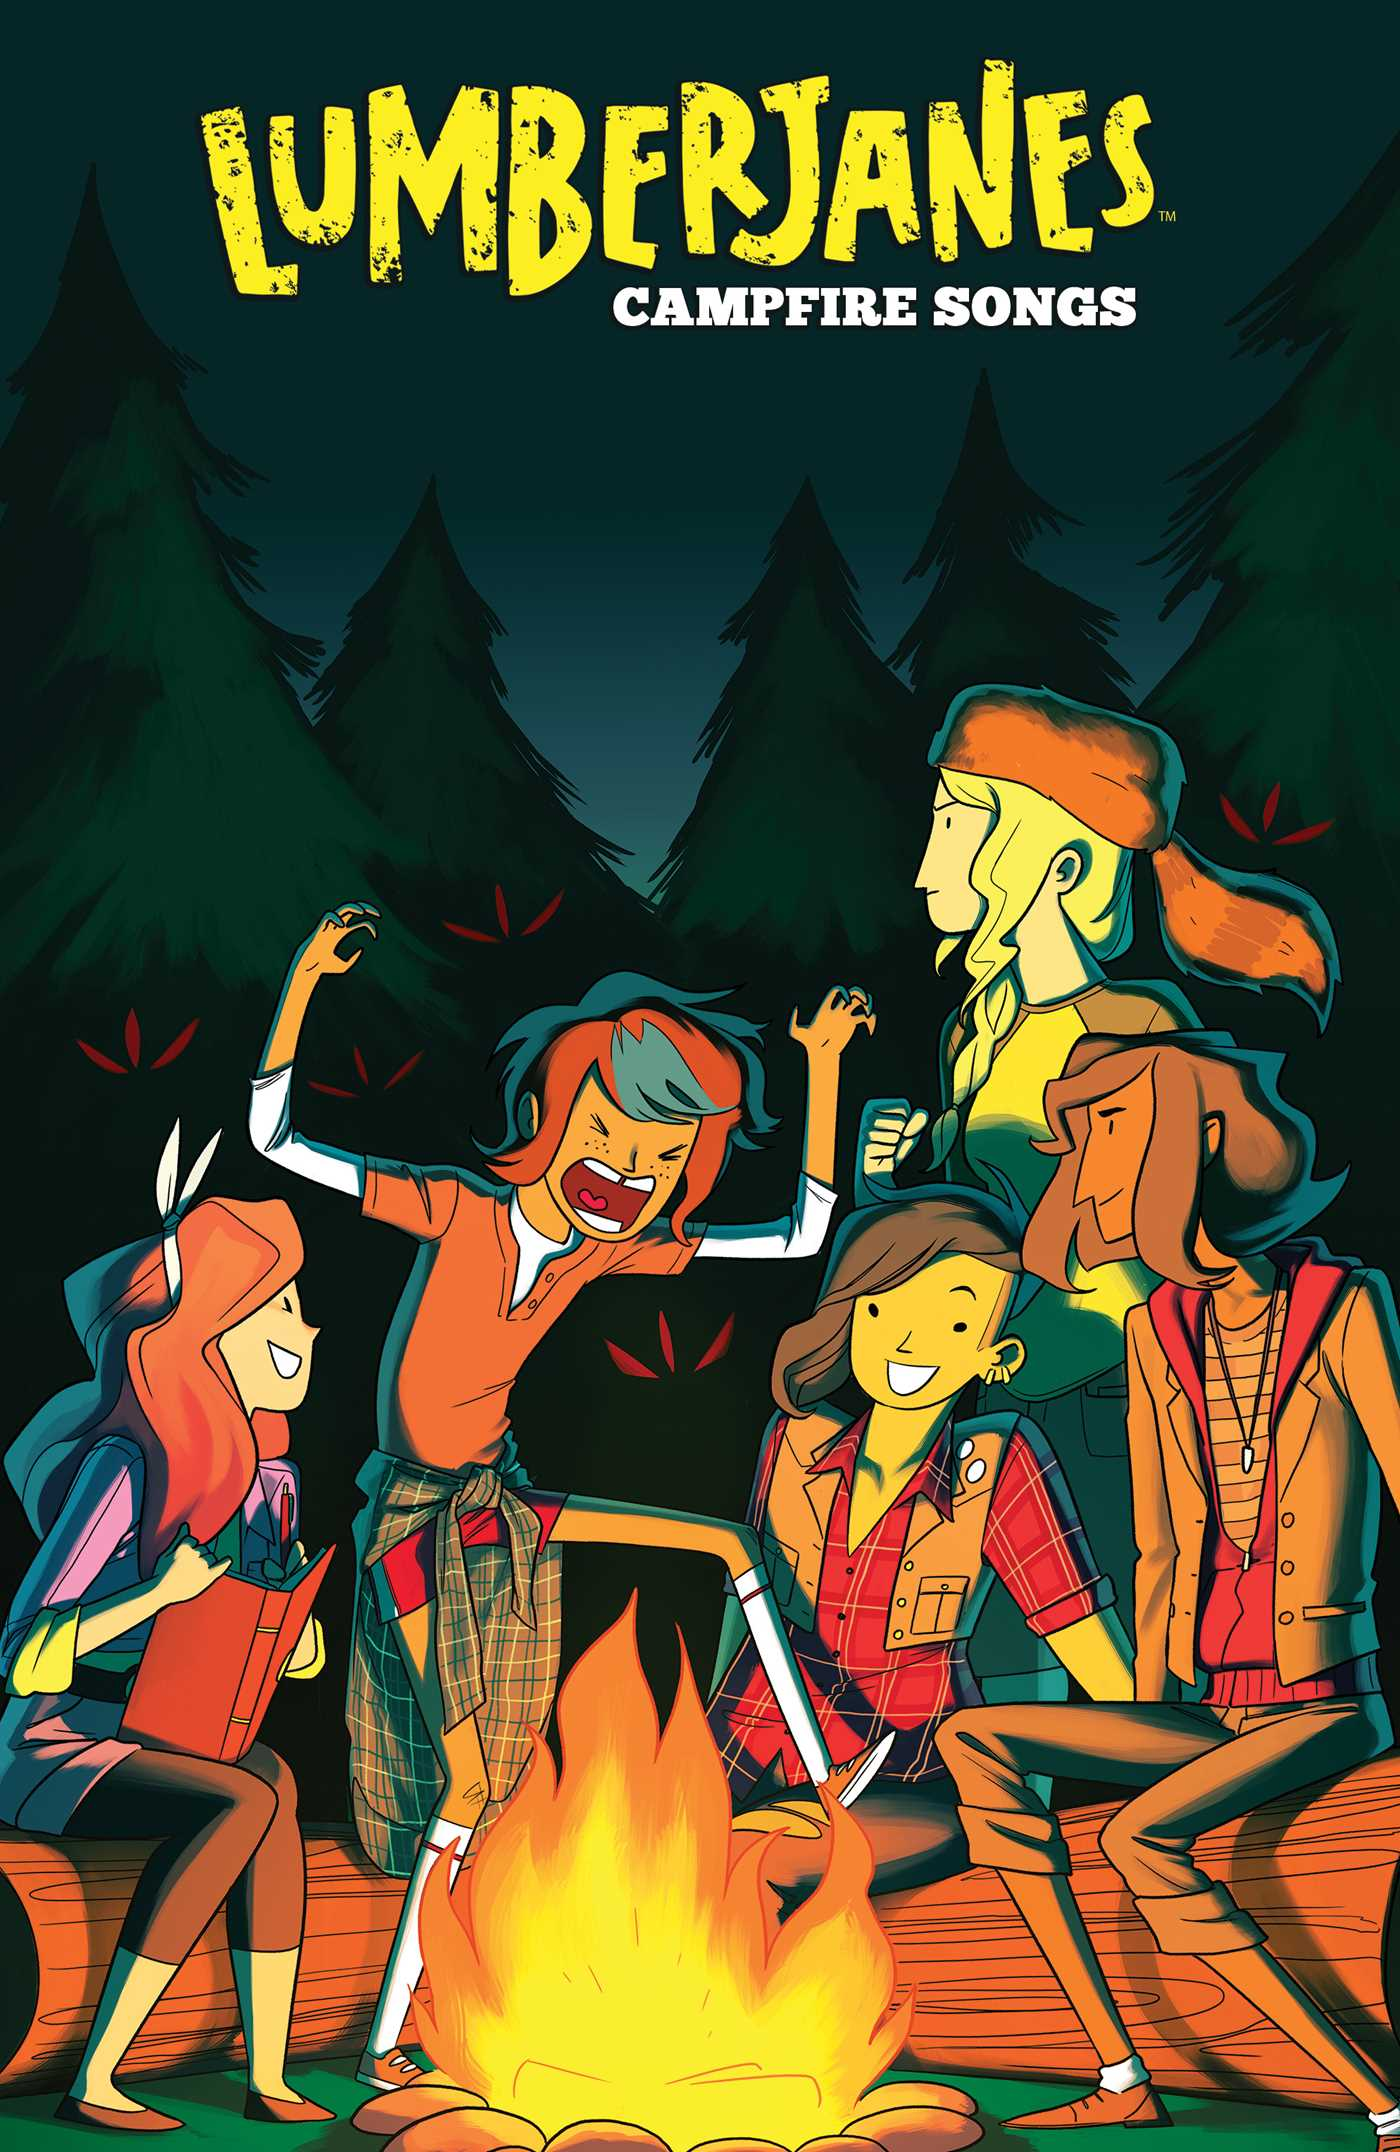 Lumberjanes: Campfire Songs by Shannon Watters